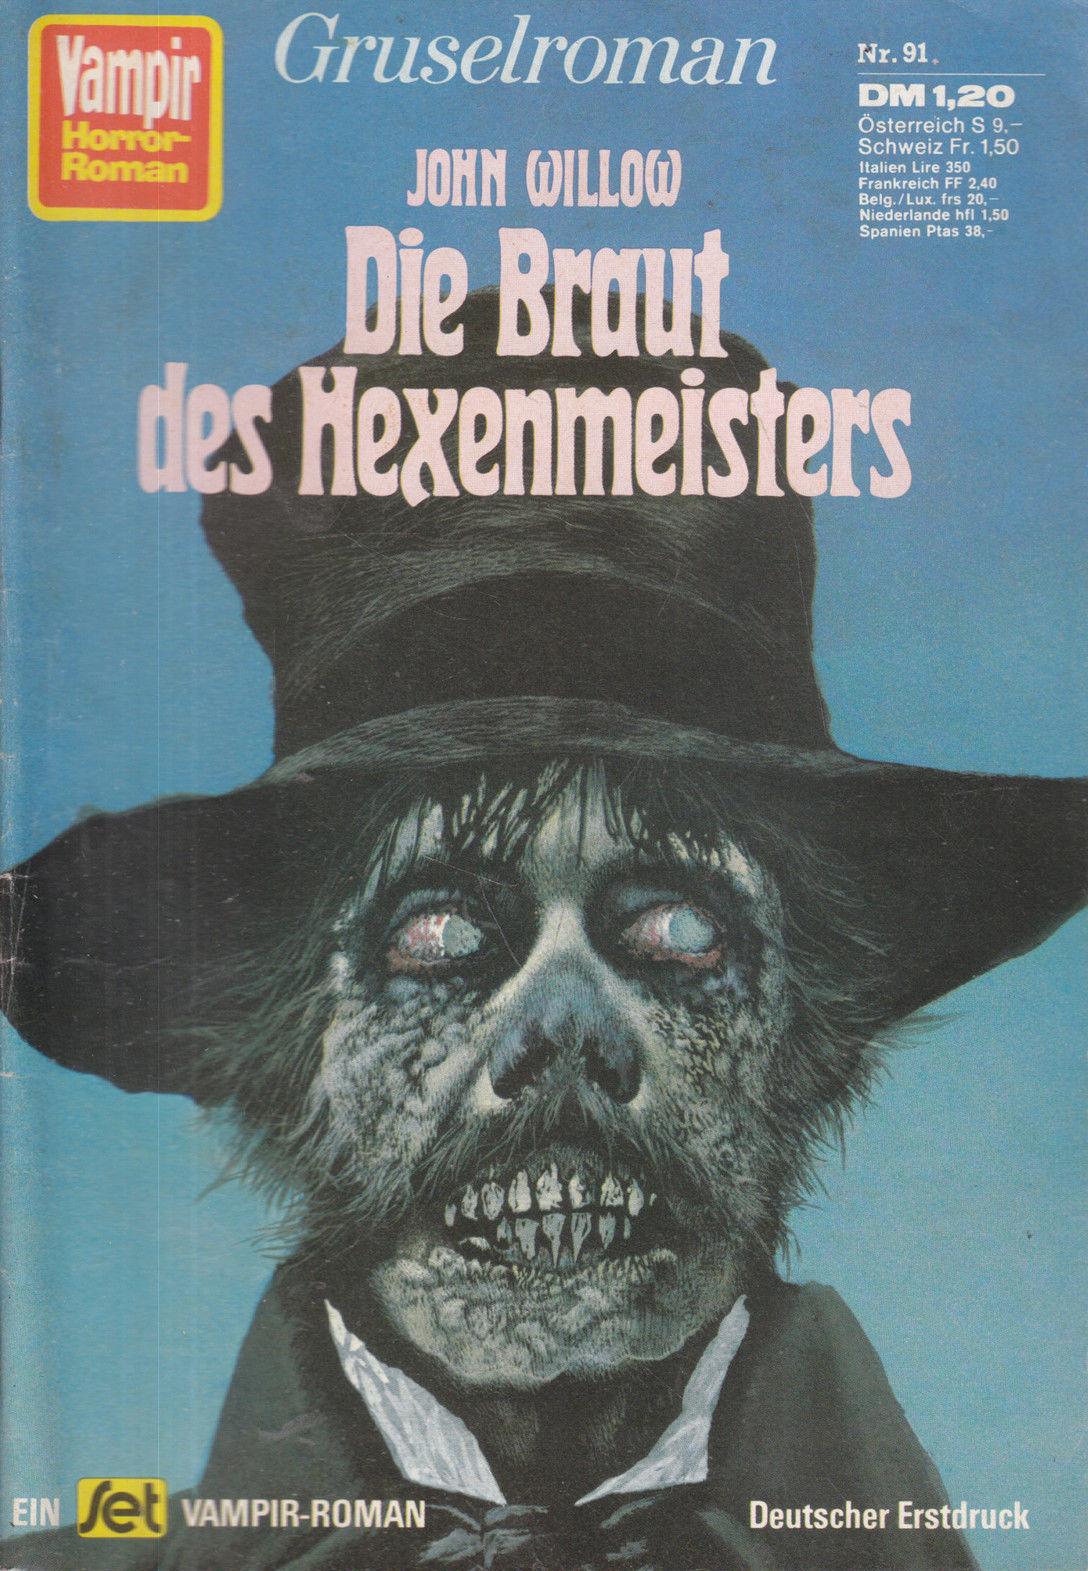 Karel Thole - Vampir Horror Roman - 091